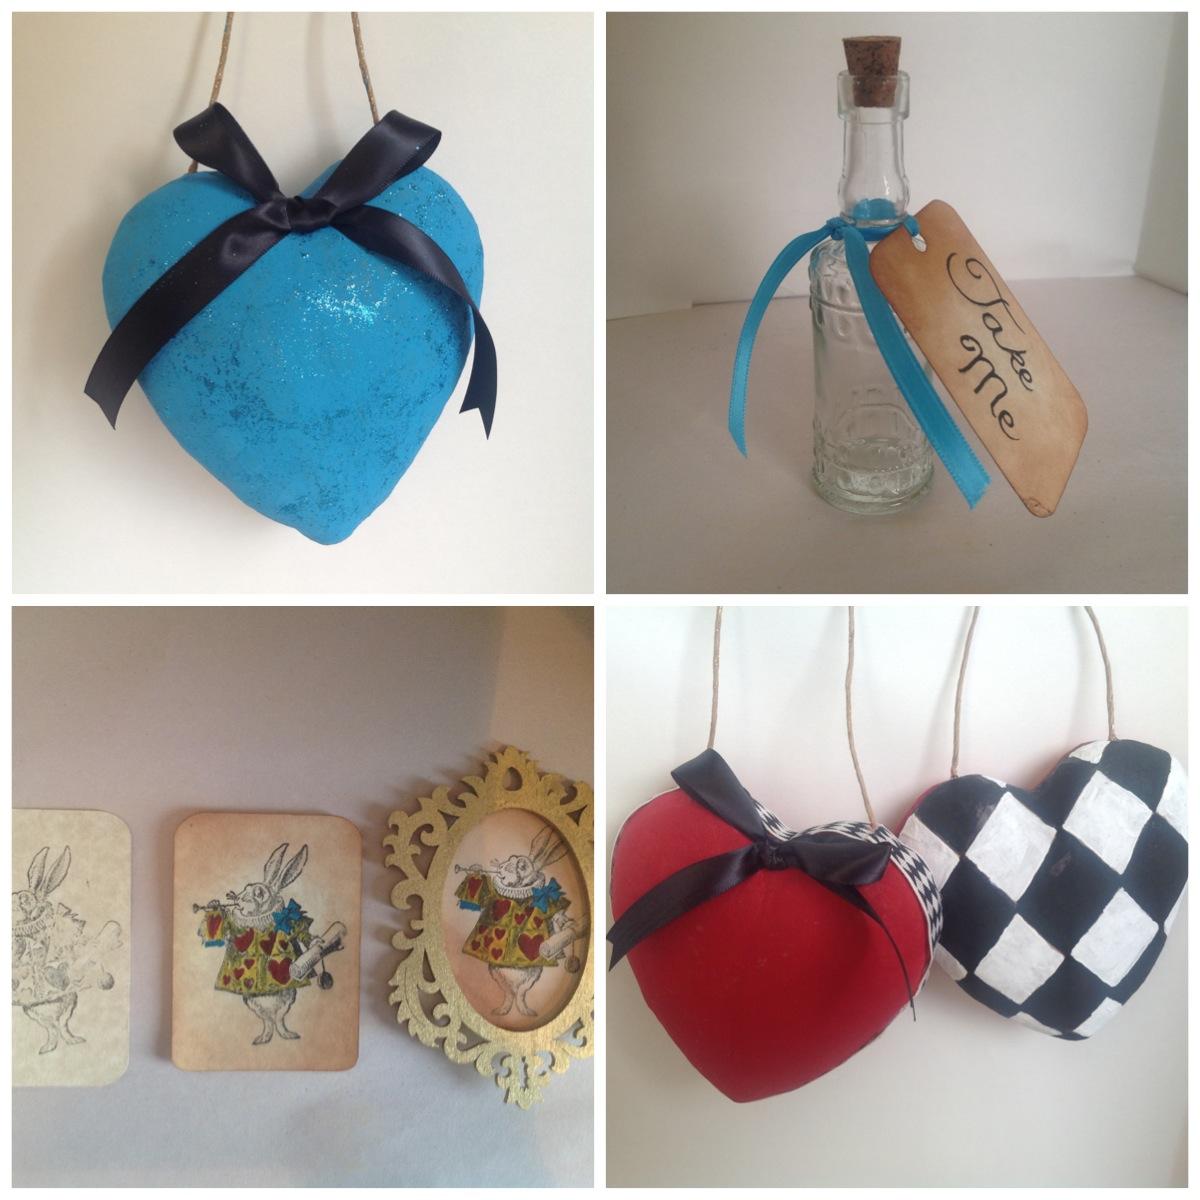 Craft room secrets alice in wonderland diy christmas for Alice in wonderland crafts